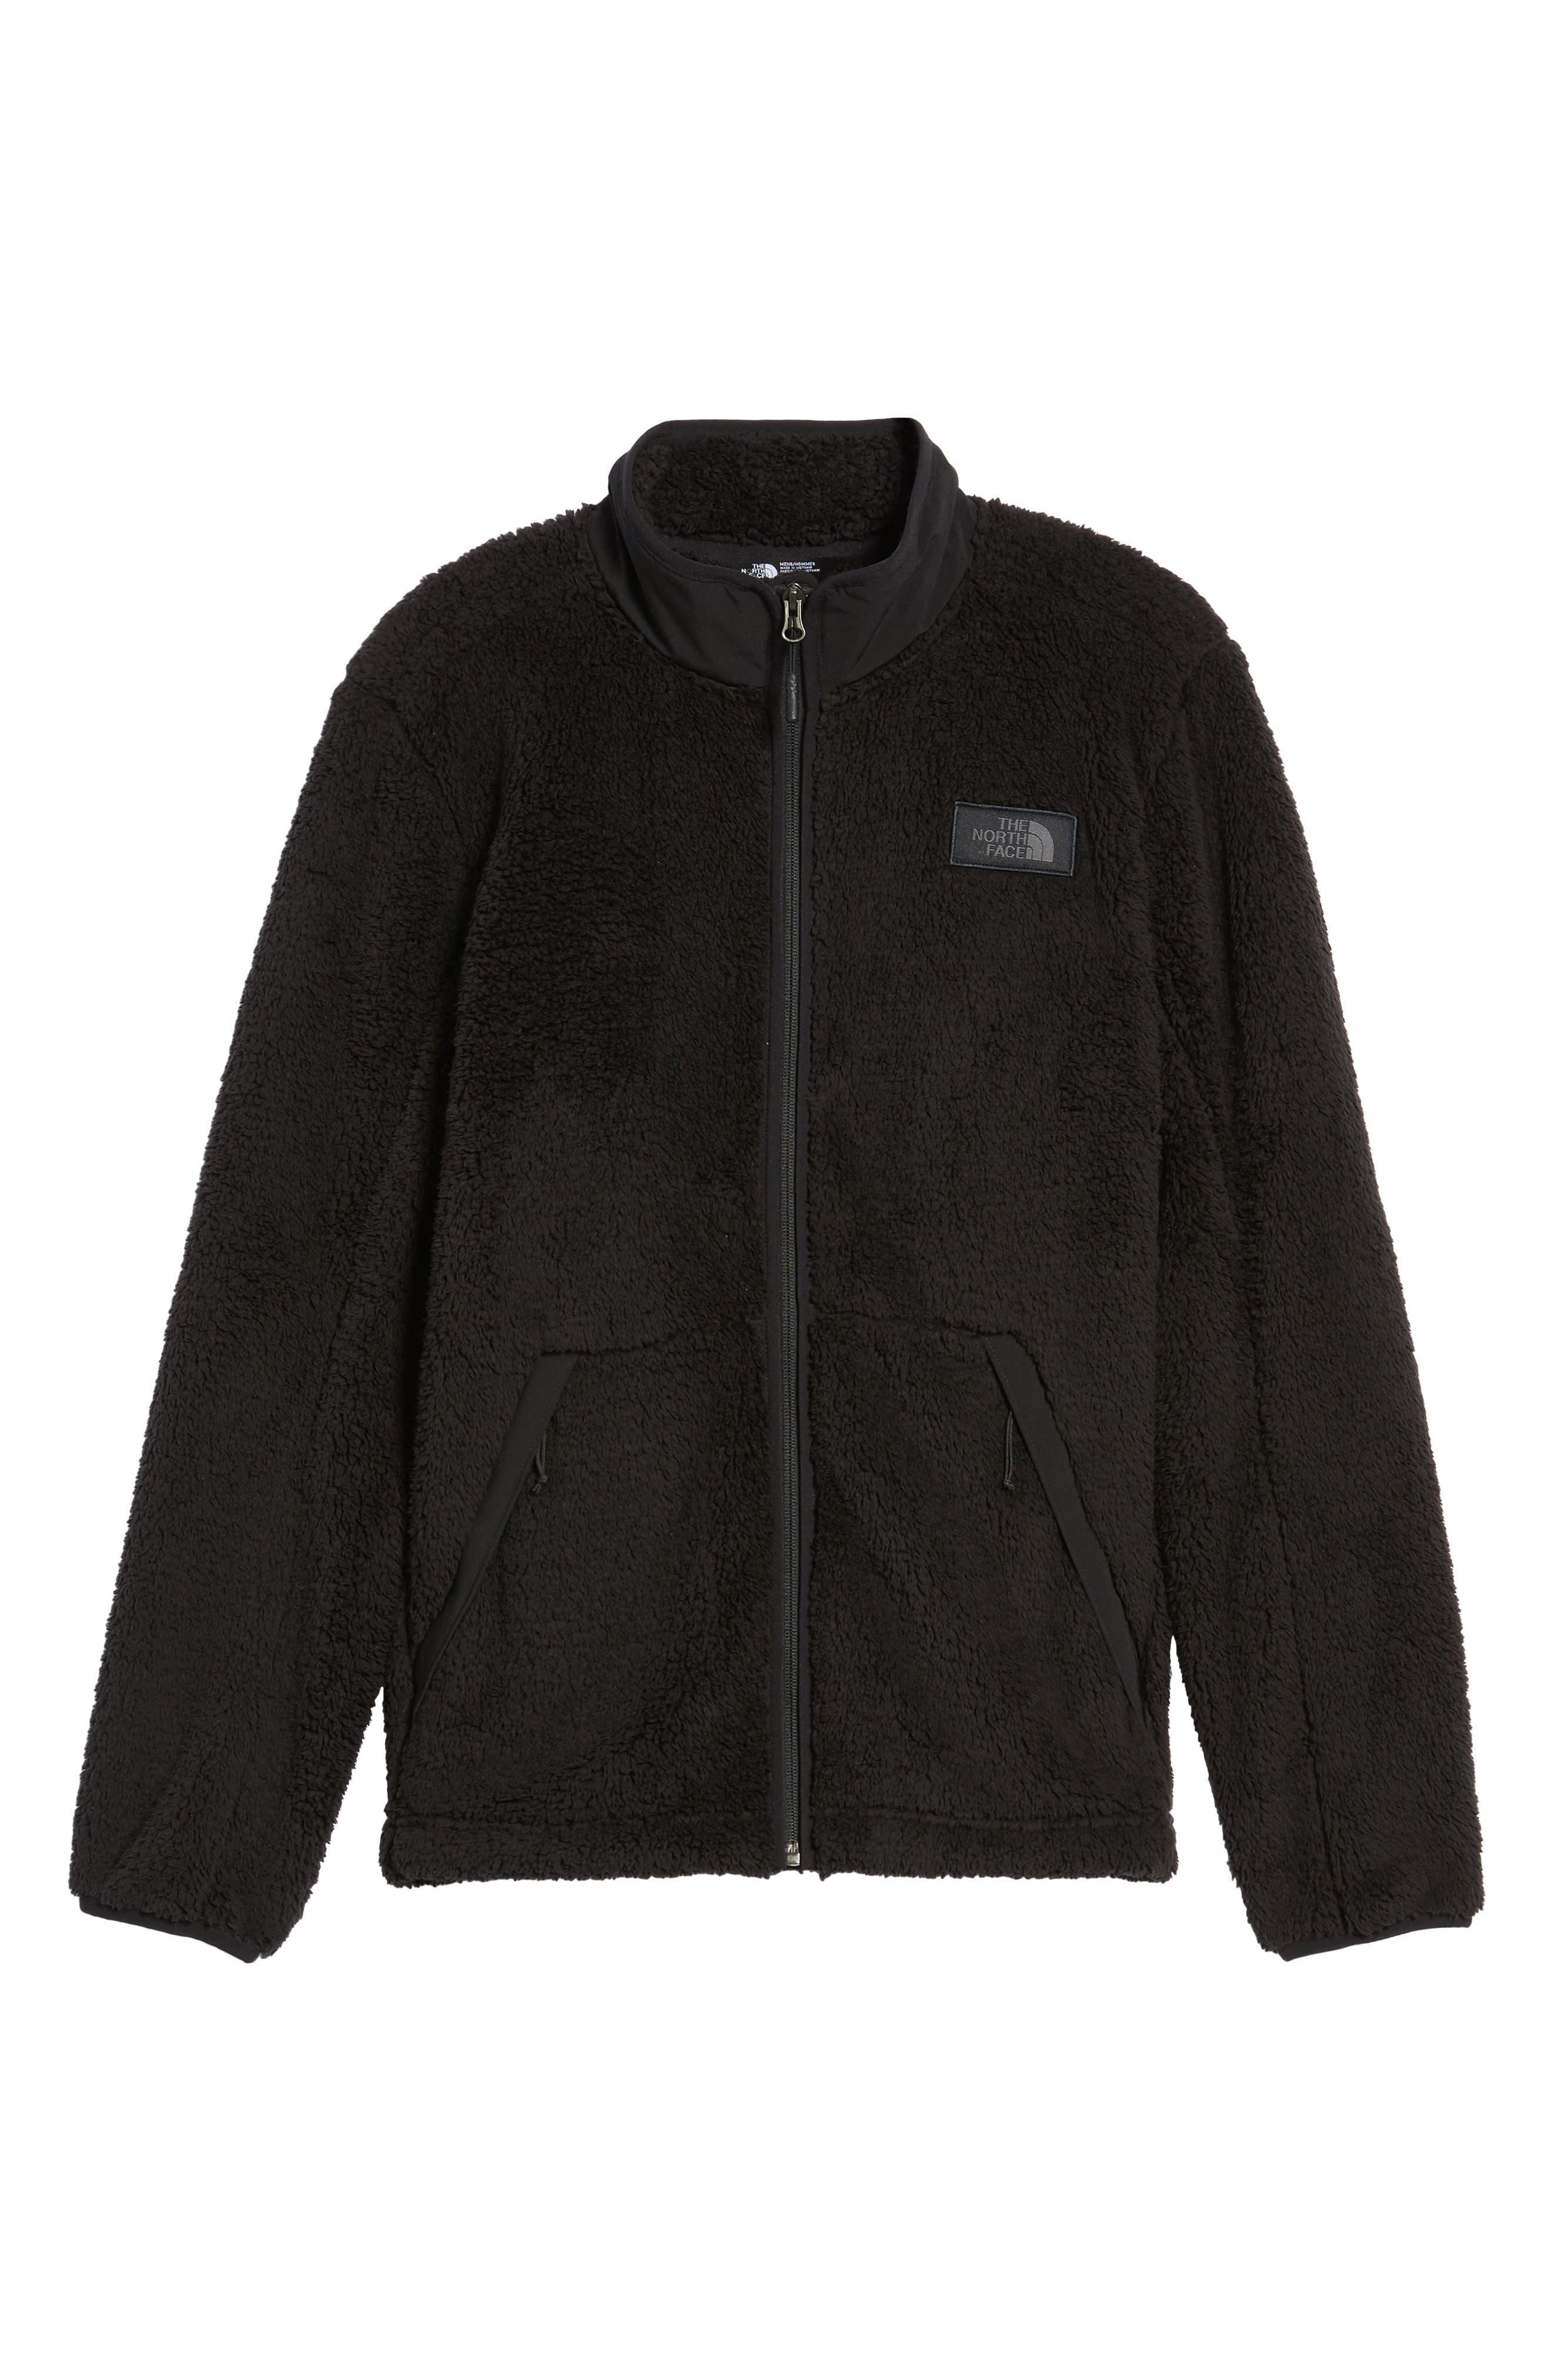 Campshire Zip Fleece Jacket,                             Alternate thumbnail 51, color,